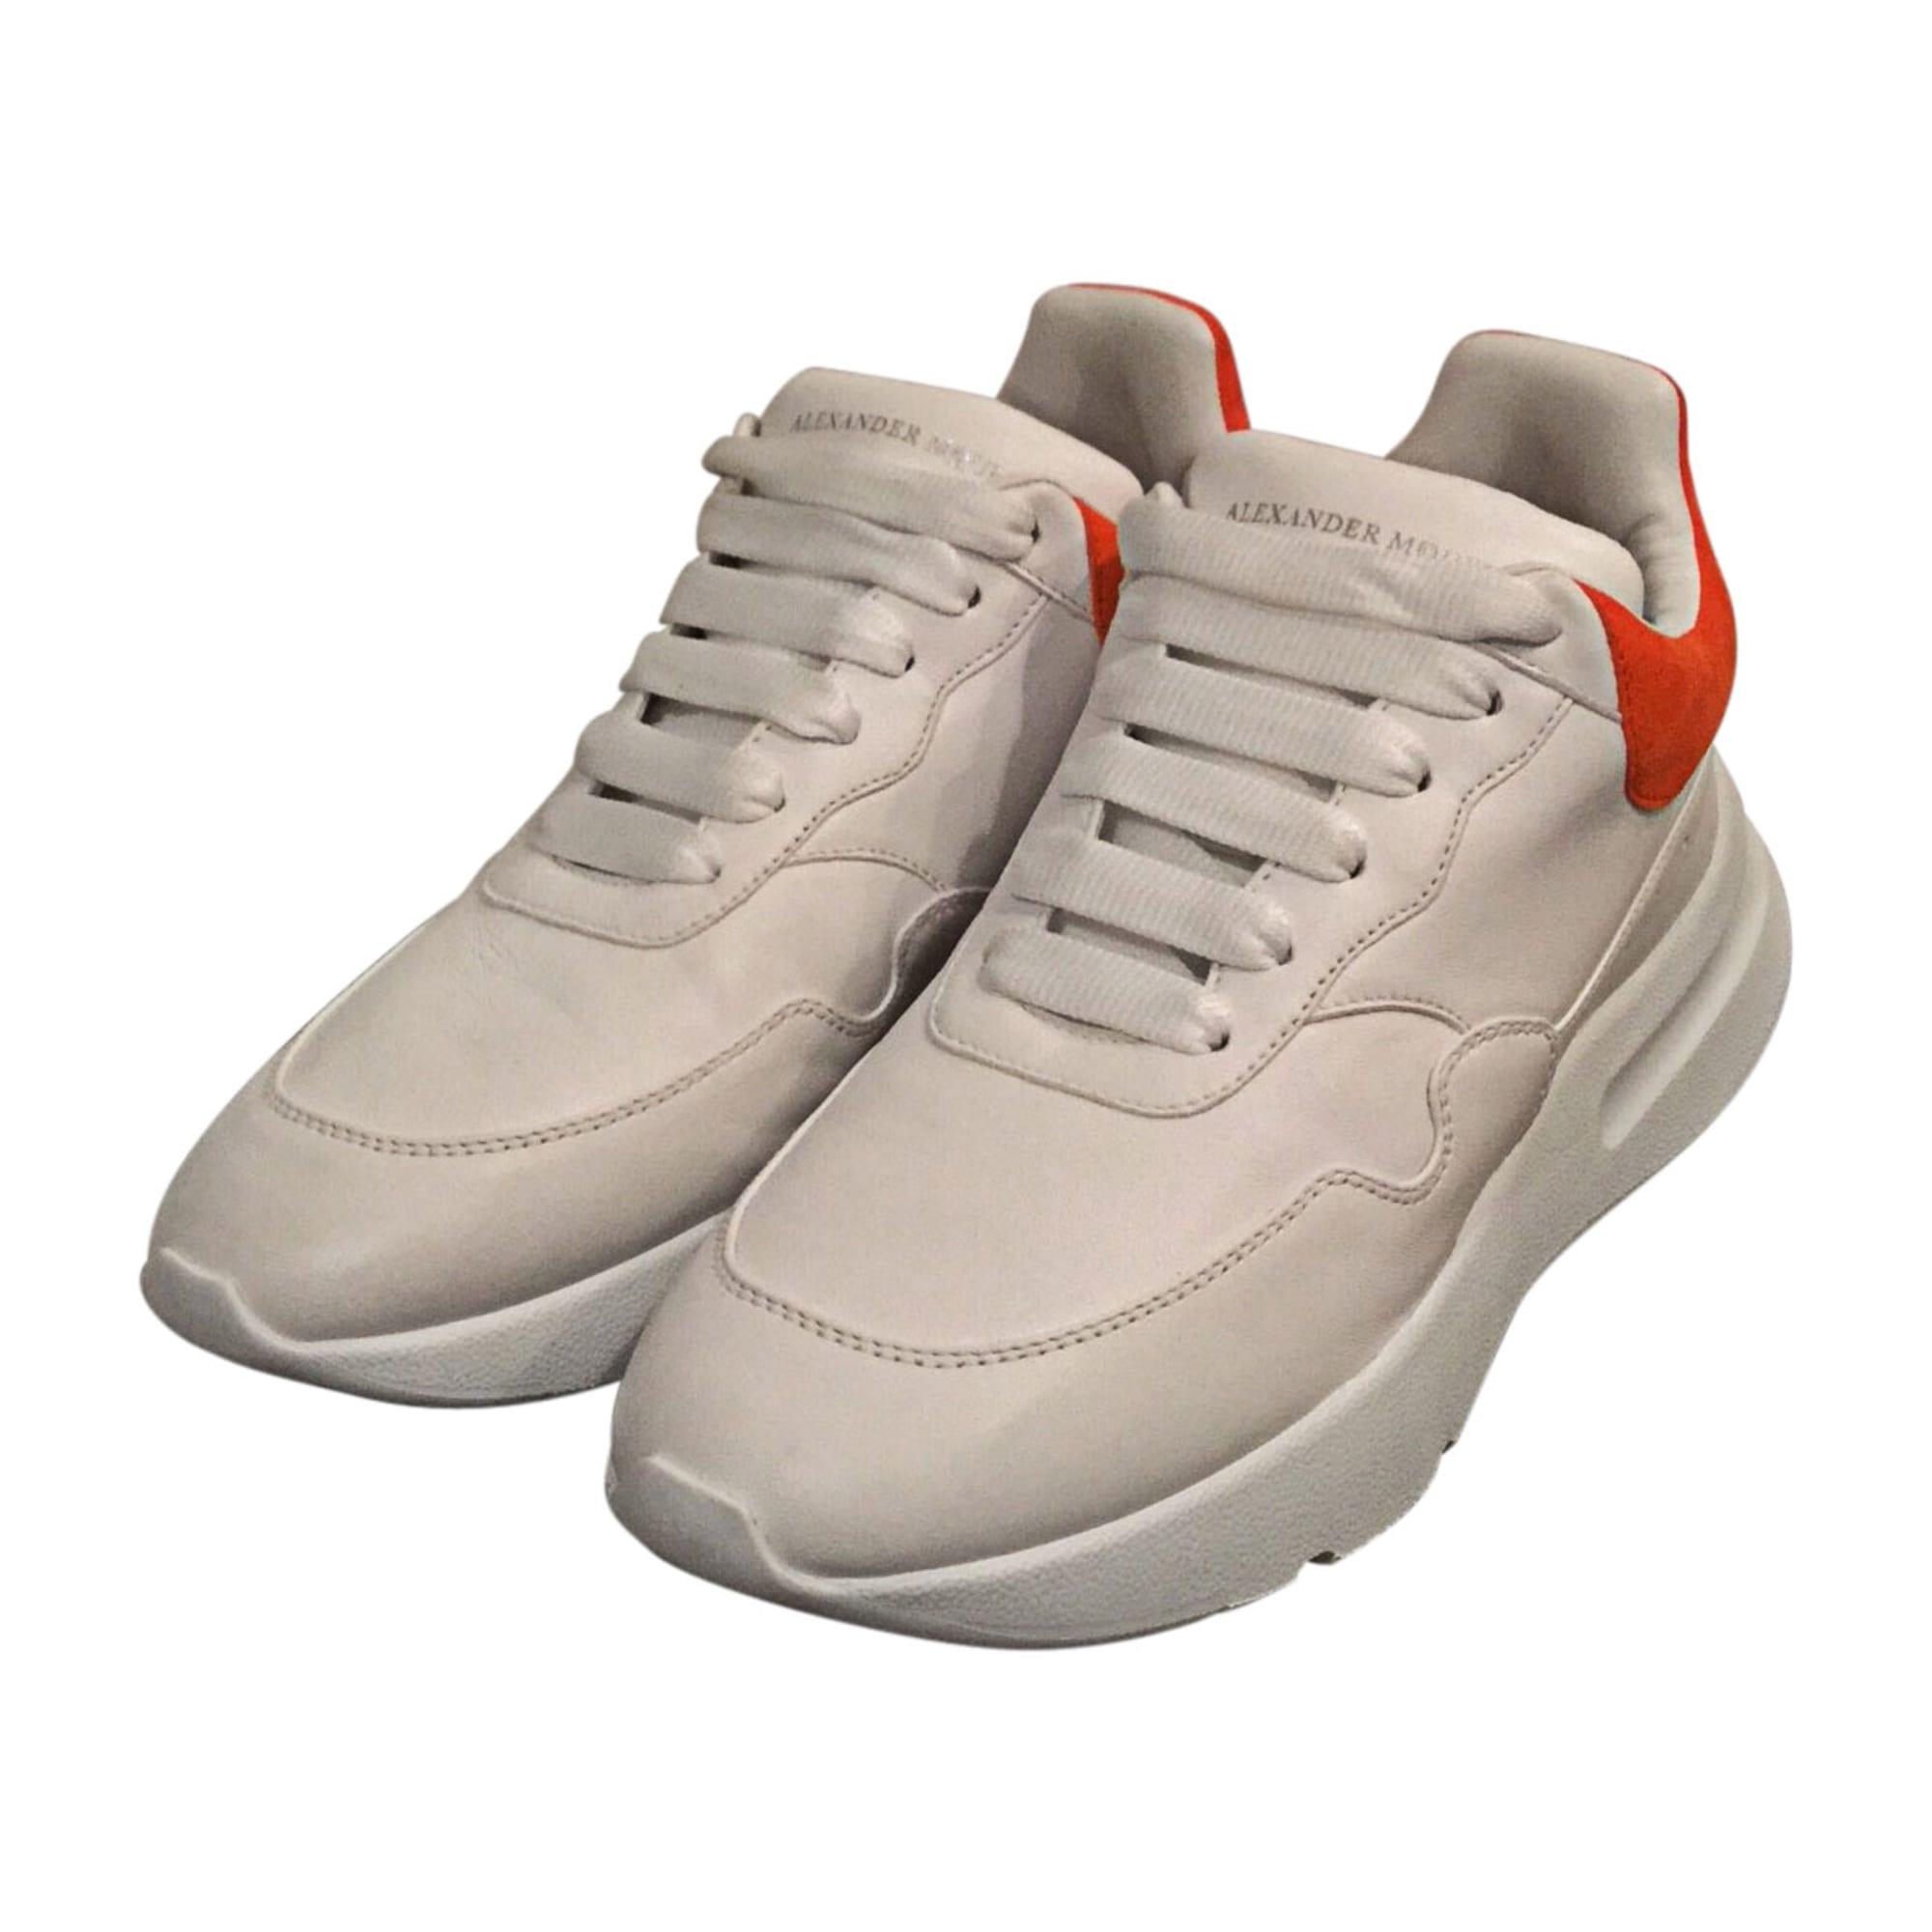 Sneakers ALEXANDER MCQUEEN White, off-white, ecru